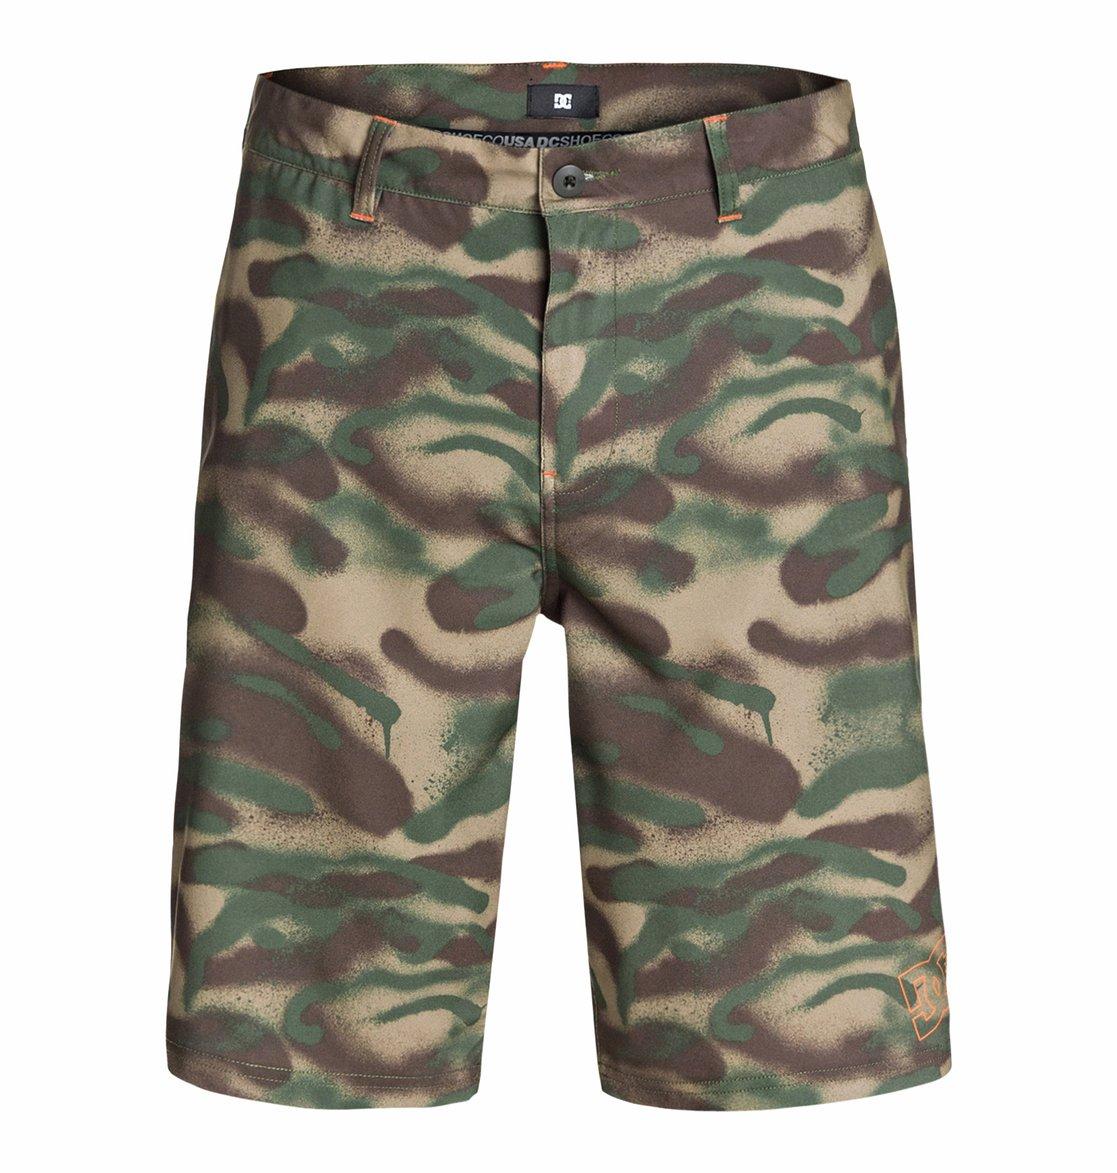 Lanai Hybrid Shorts от DC Shoes